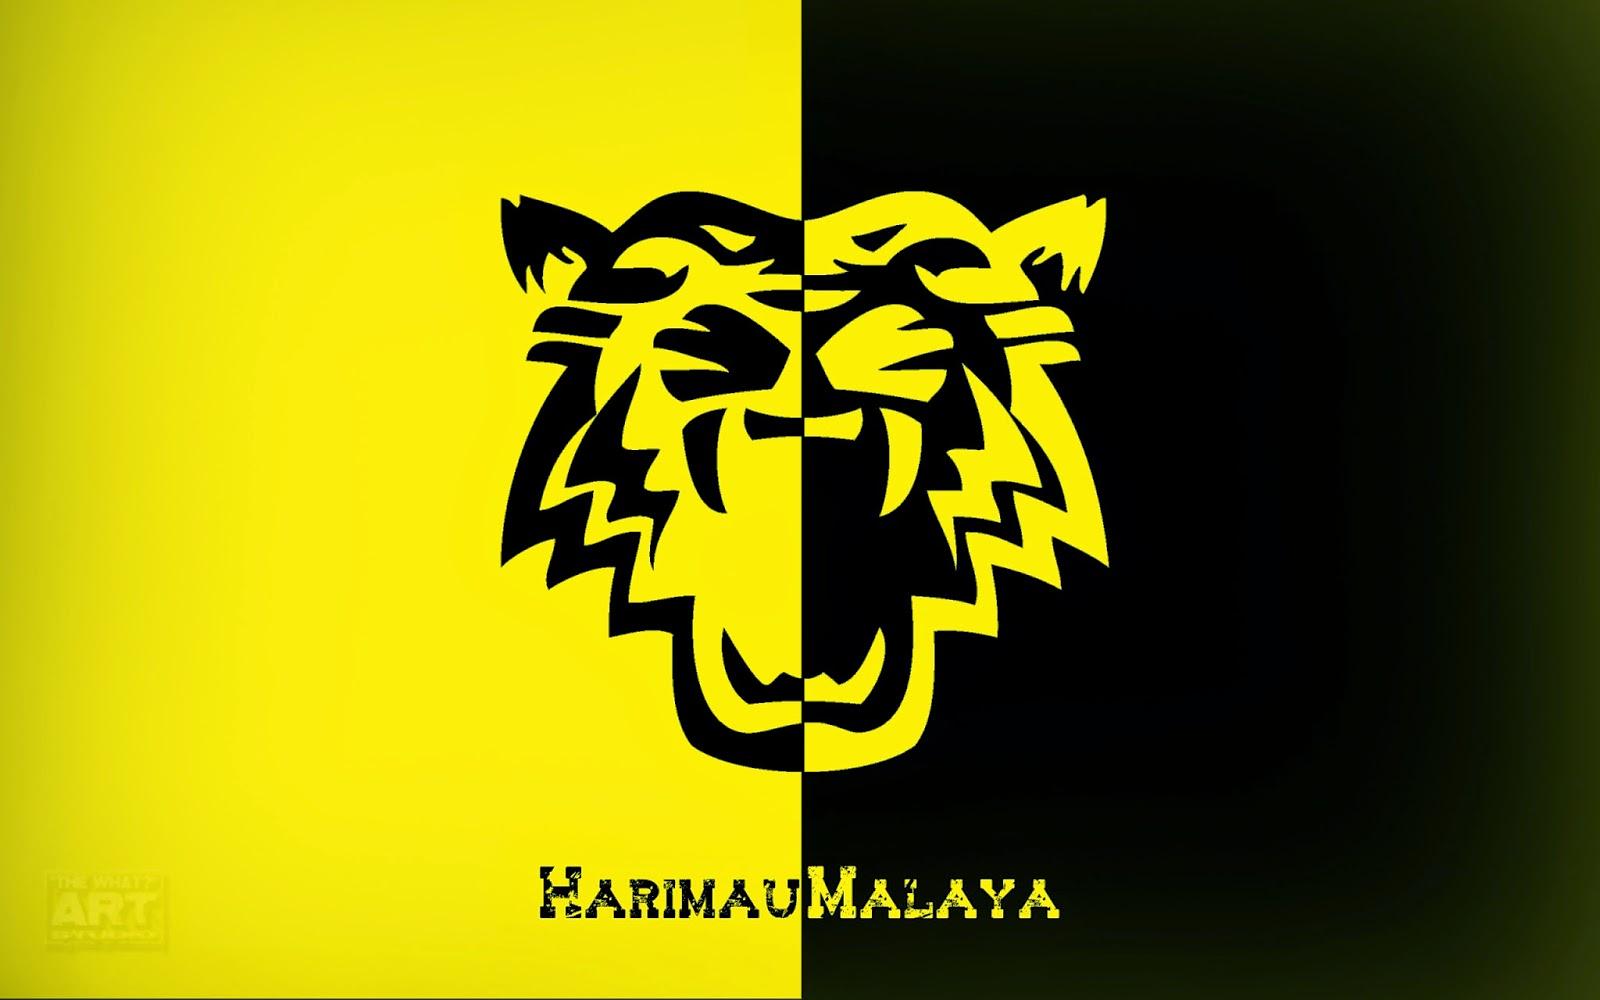 aff suzuki cup, final, malaysia vs thailand, harimau malaya